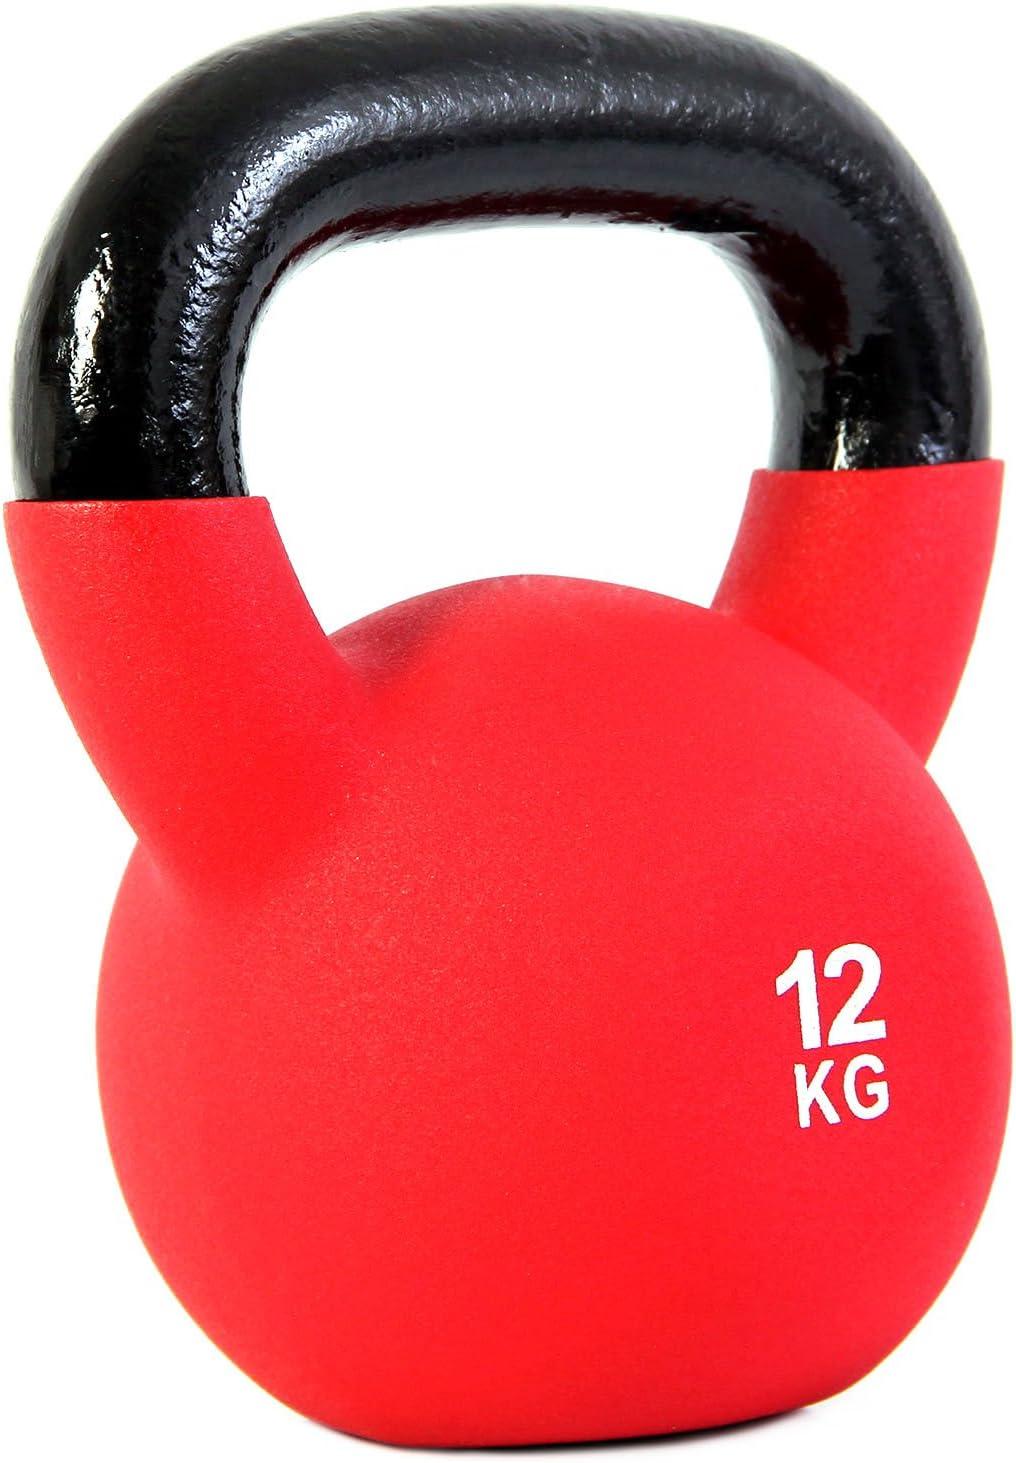 Rojo PDF Workout Pesa Rusa con Revestimiento de Neopreno POWRX Kettlebell Hierro Fundido 4-30 kg